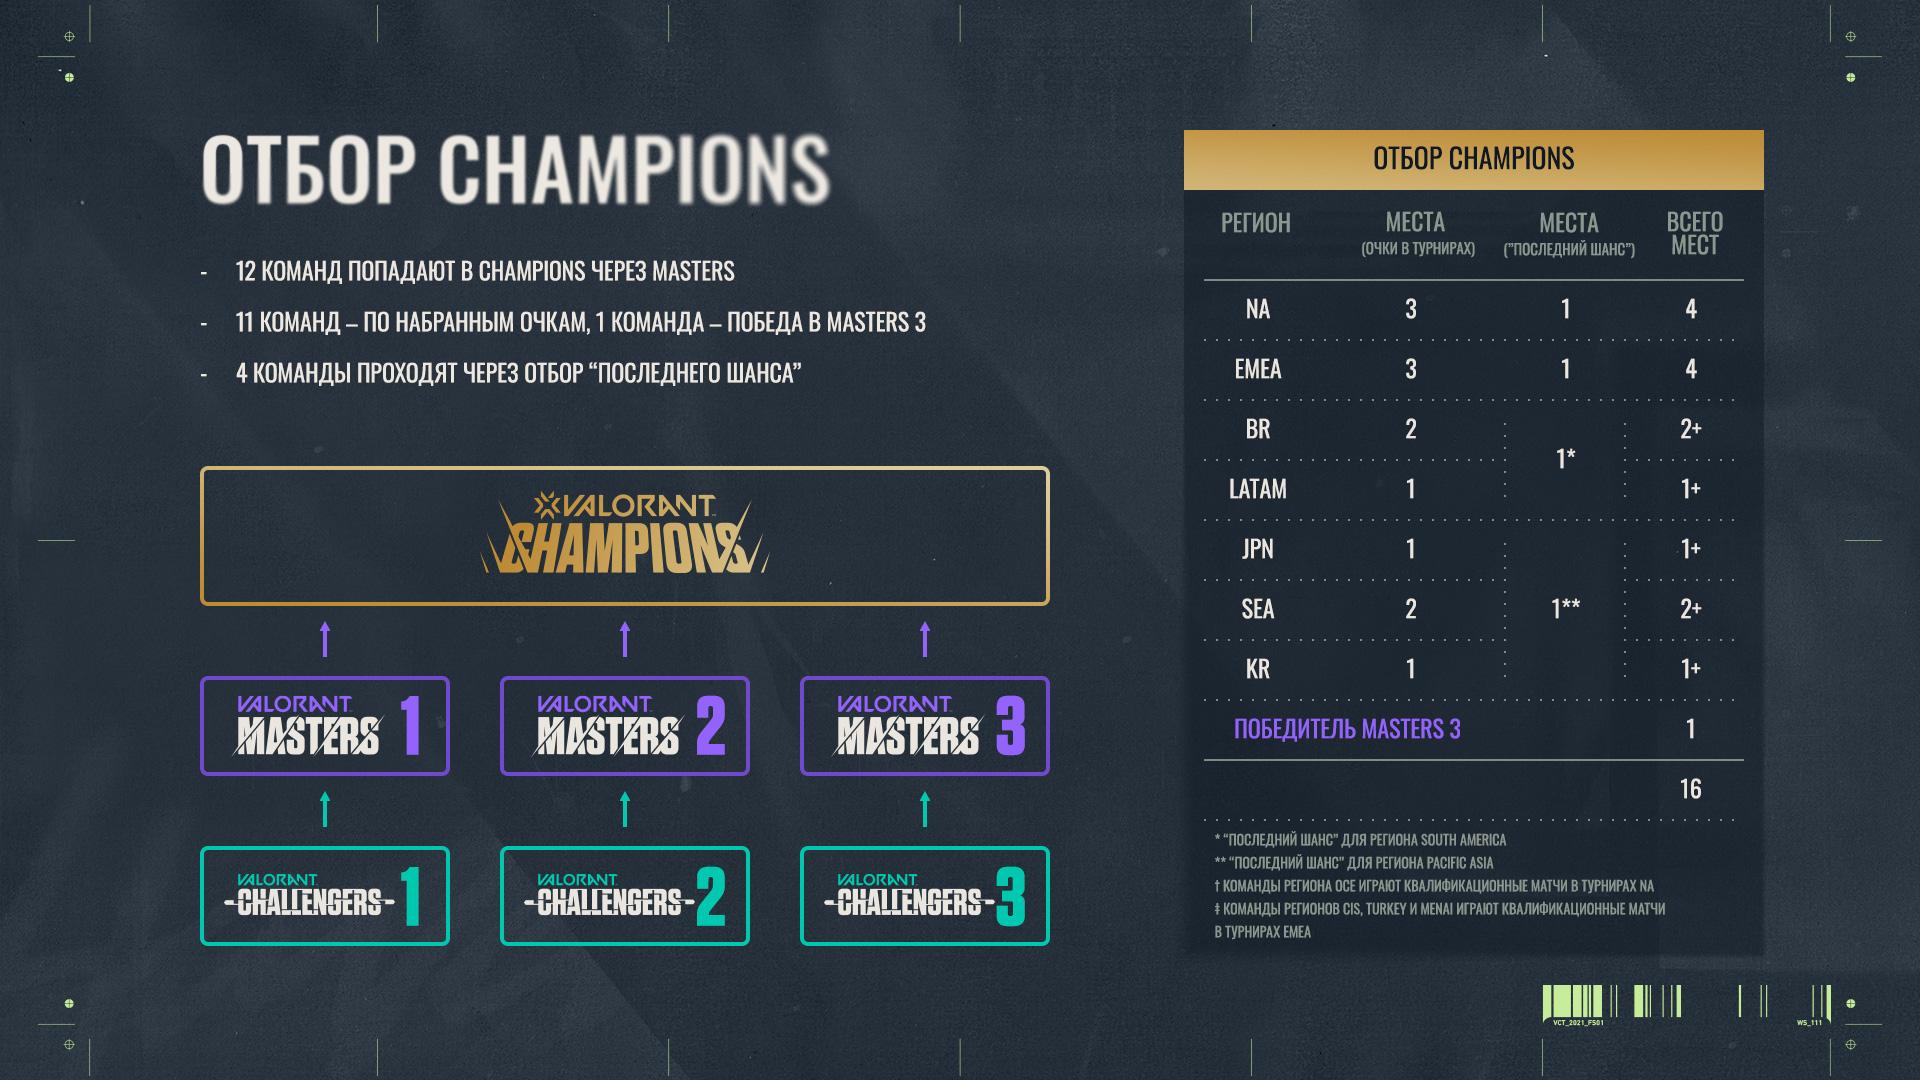 Copy-of-04-championsqualification-v1.jpg